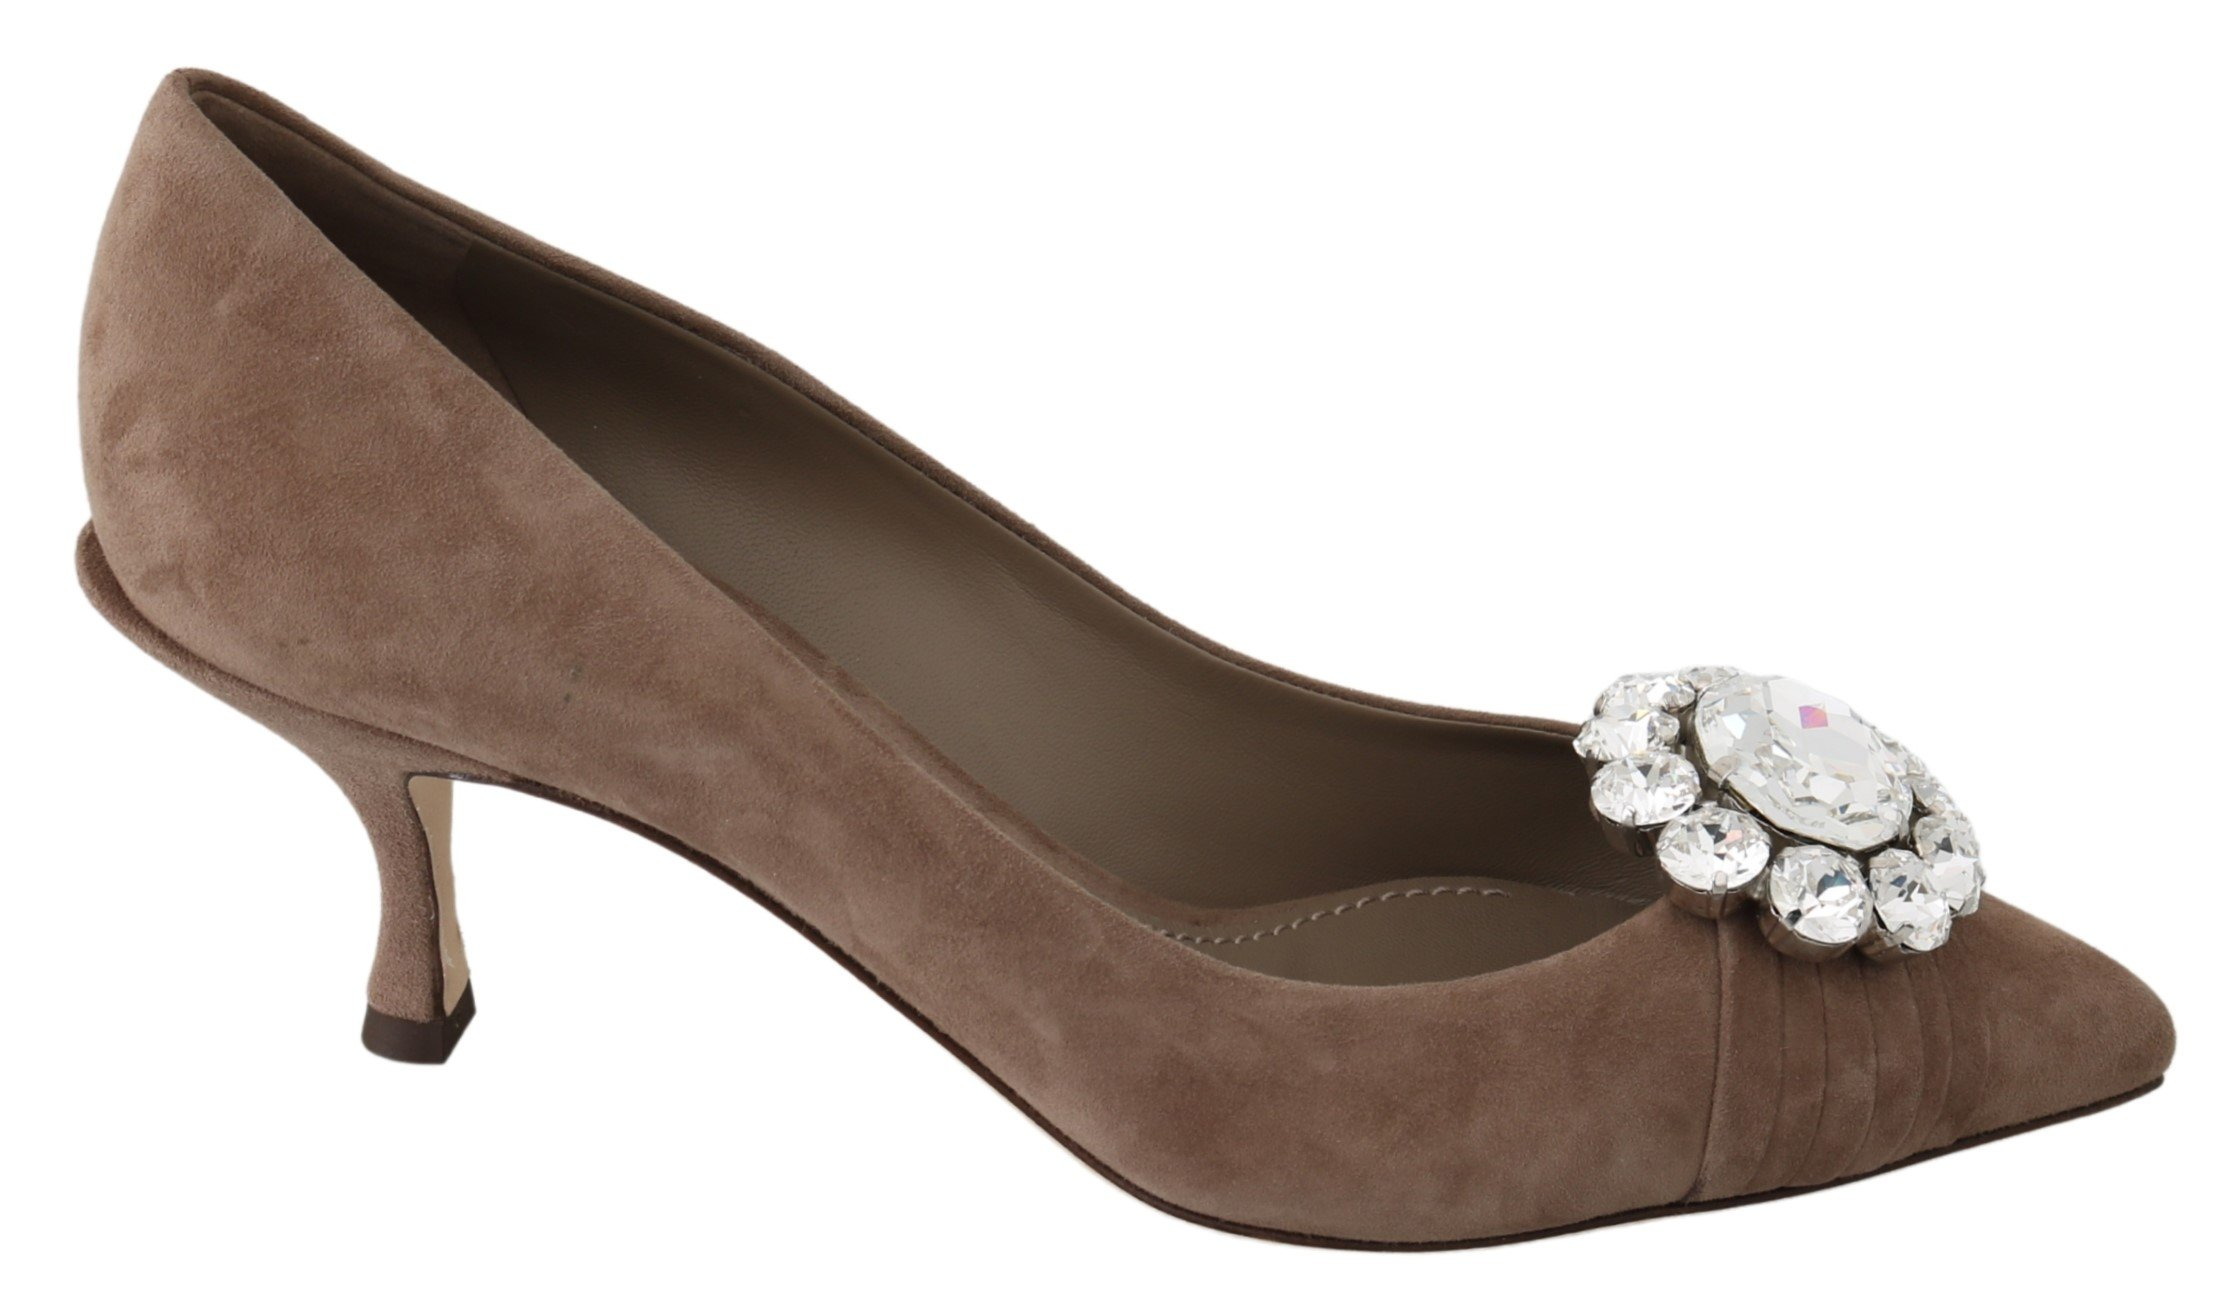 Dolce & Gabbana Women's Suede Crystals Pumps Brown LA7229 - EU39/US8.5